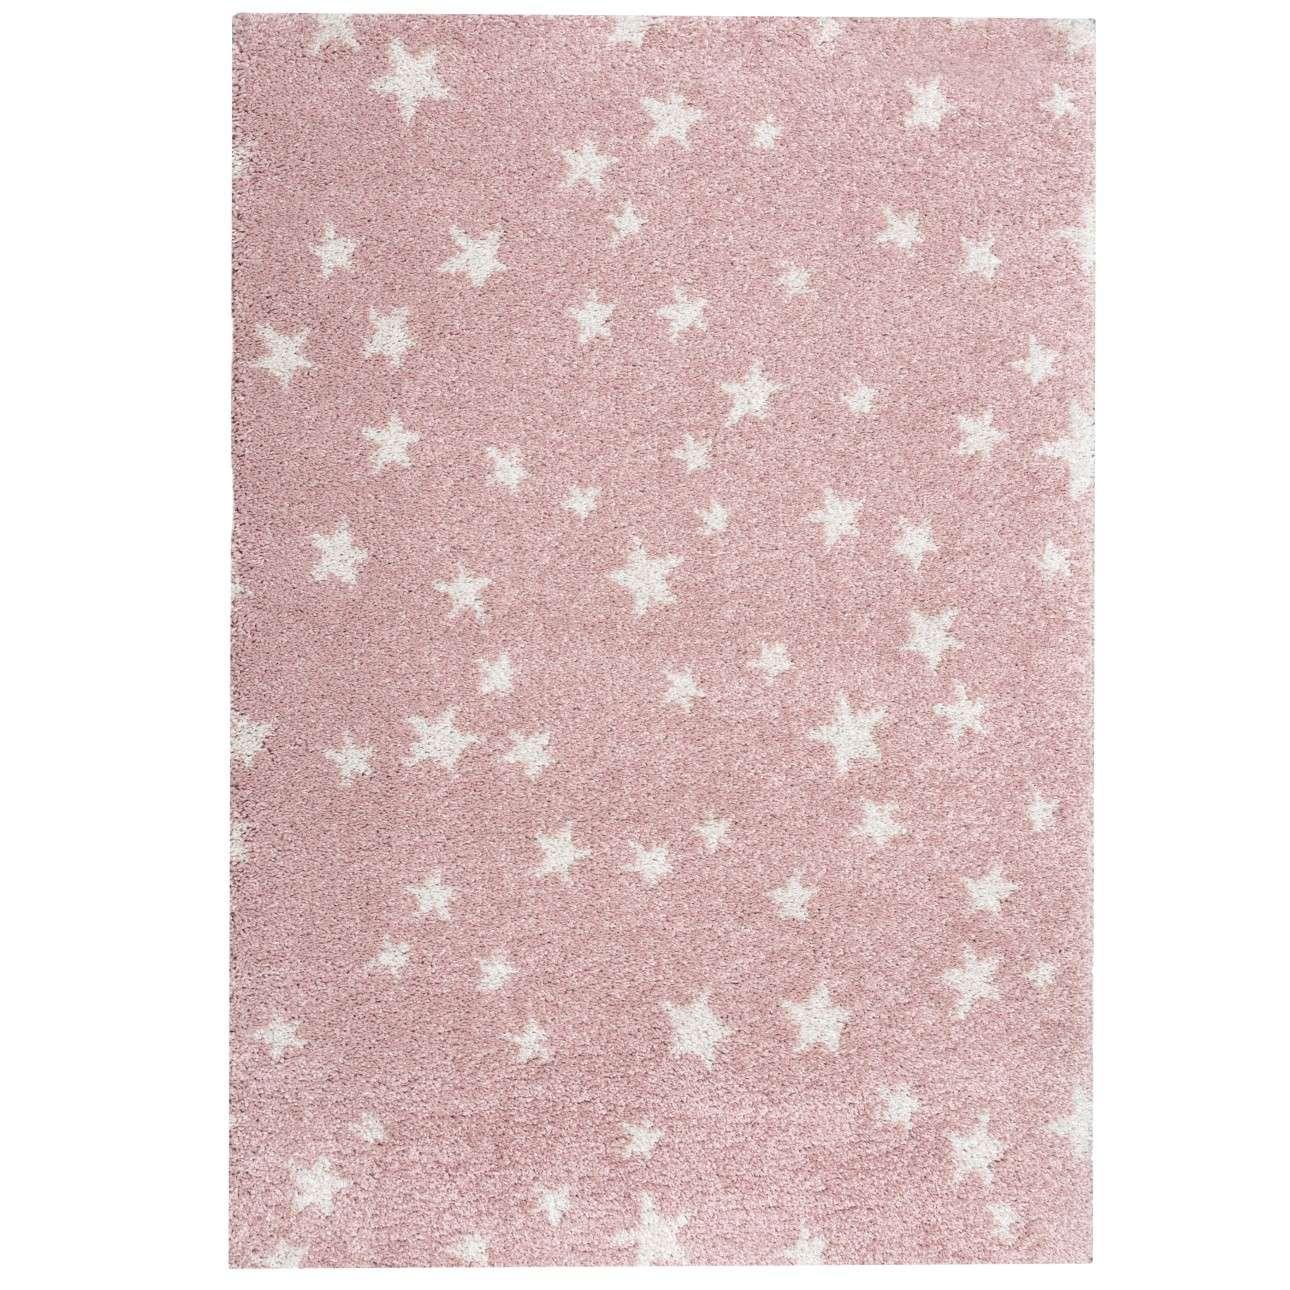 Koberec Candy Stars rose 120x170cm